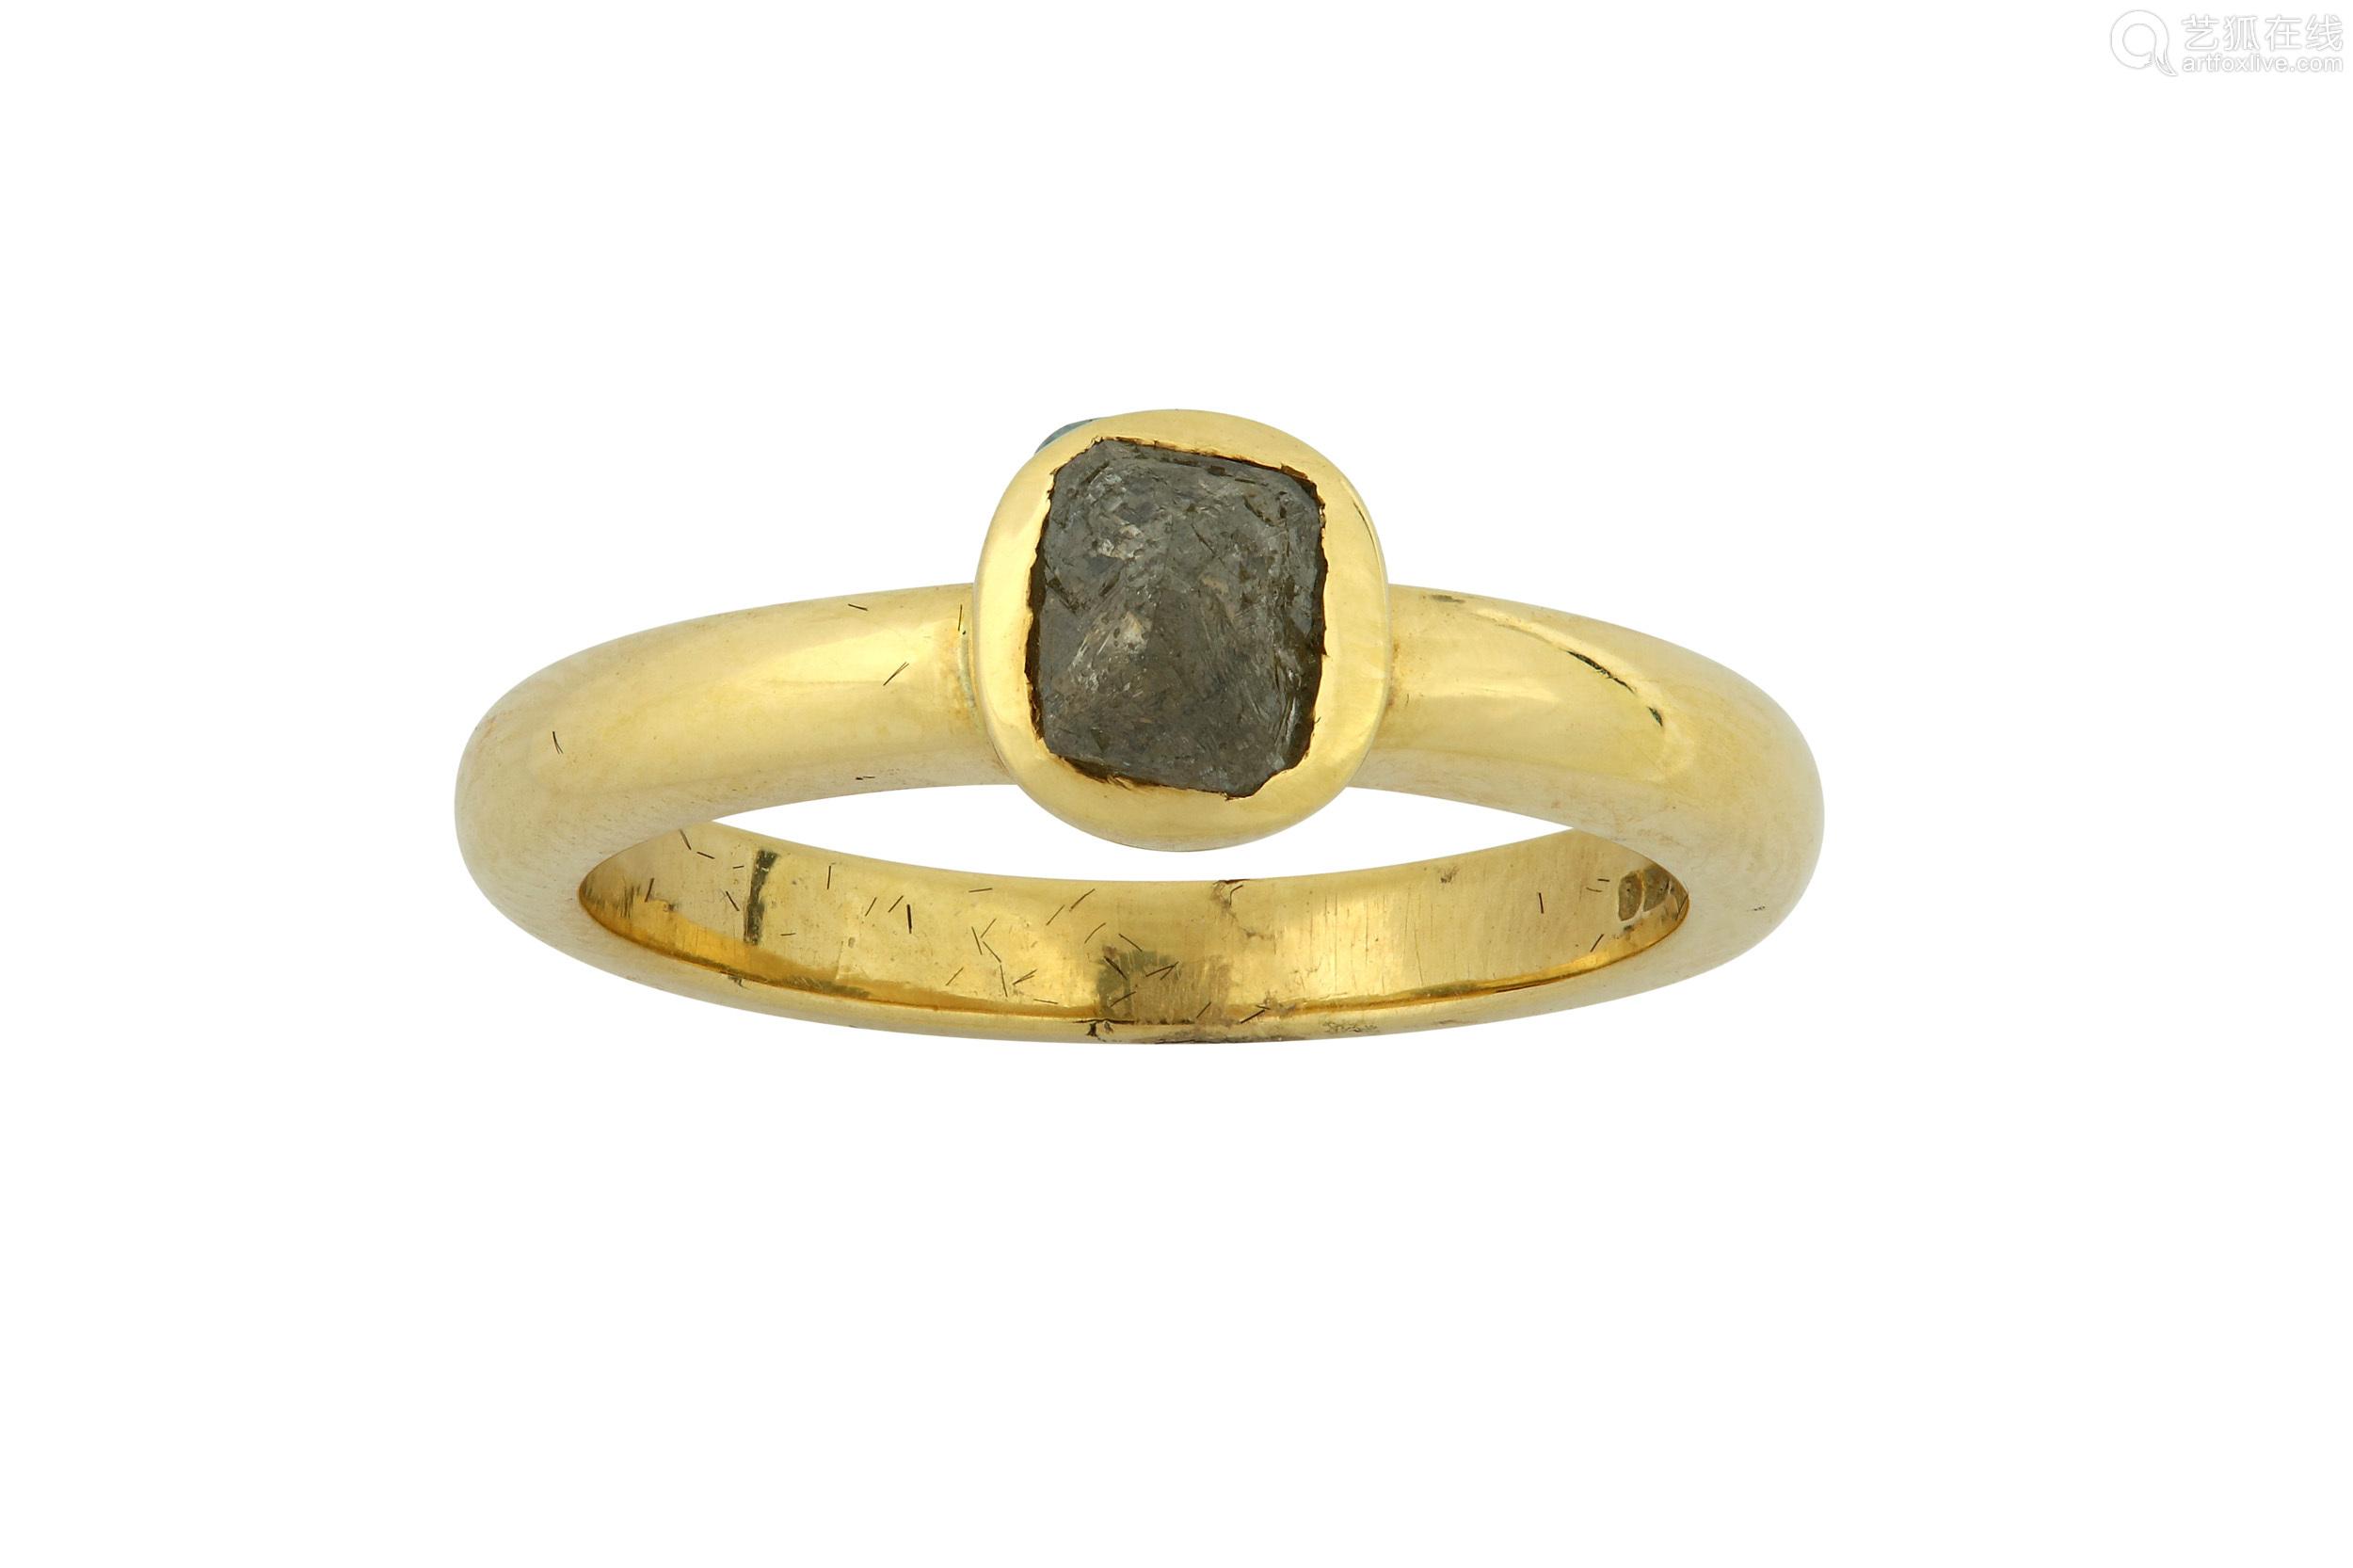 A gold anddiamond single-stone ring